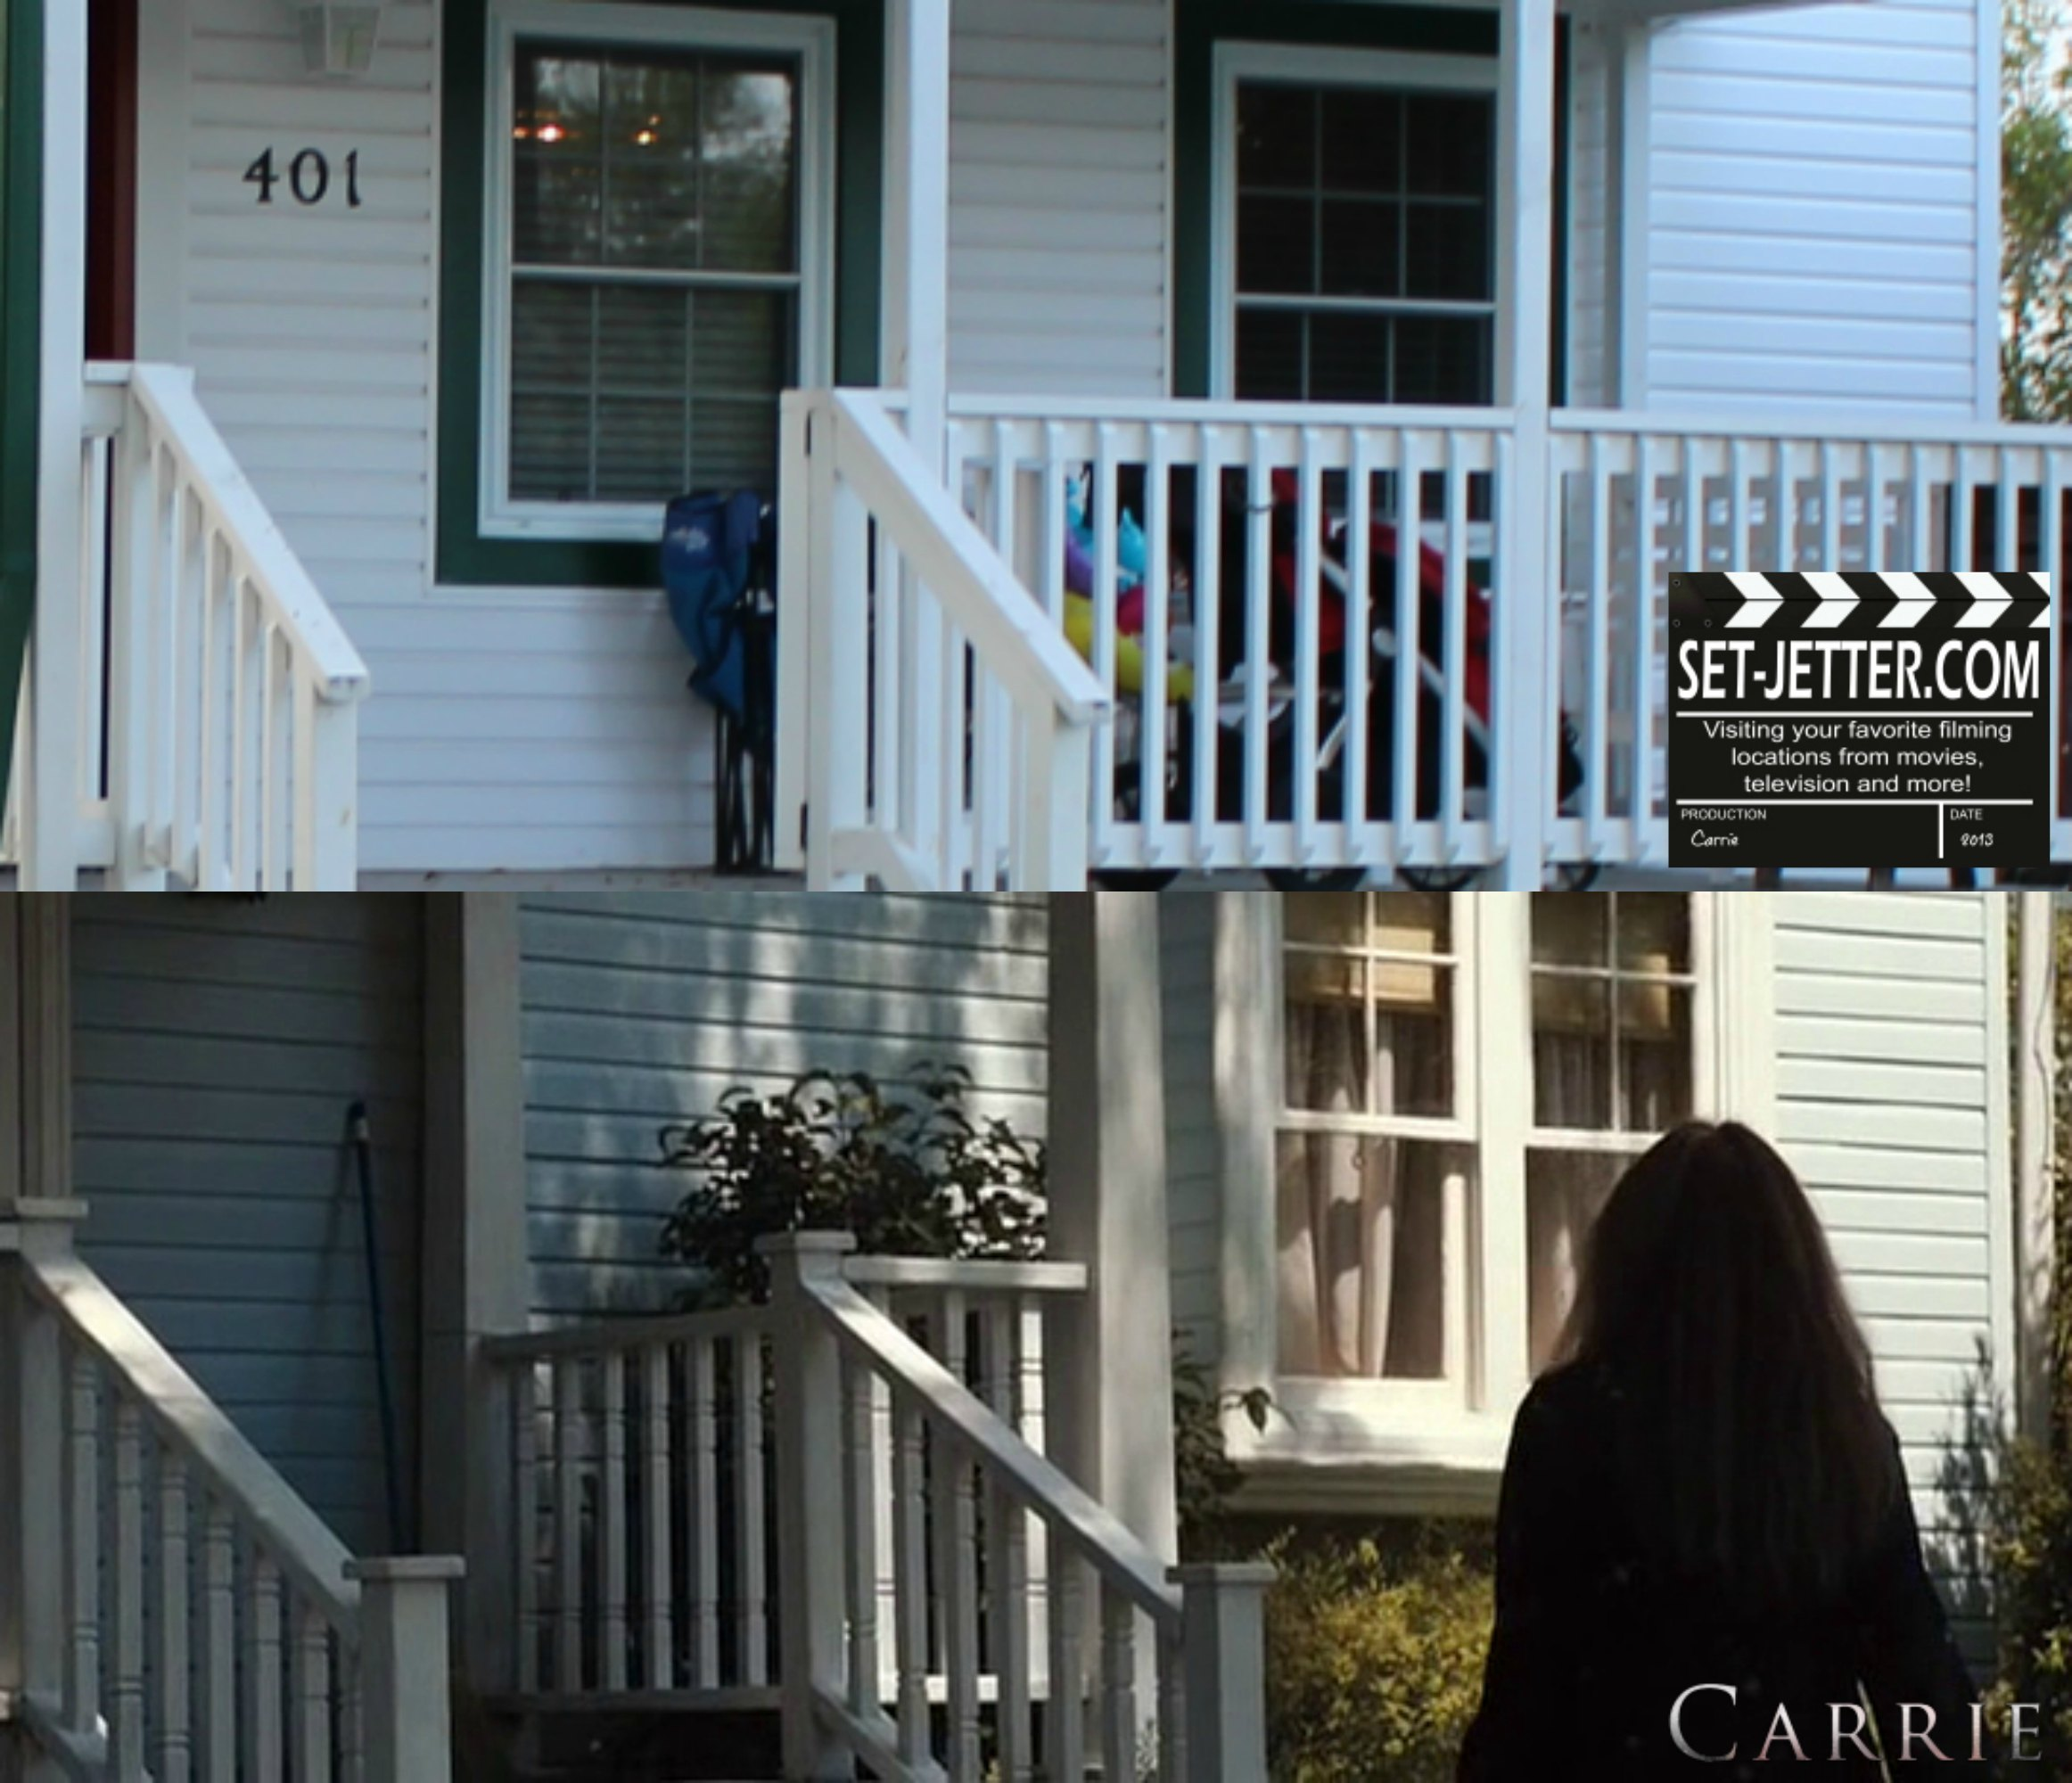 Carrie 2013 comparison 10.jpg